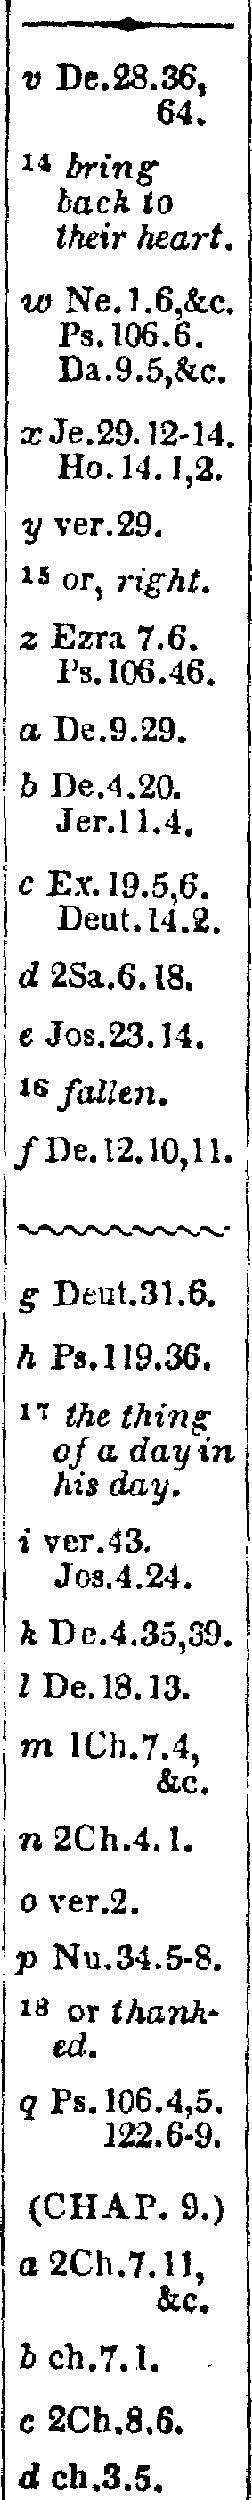 [merged small][merged small][ocr errors][ocr errors][ocr errors][ocr errors][merged small][merged small][merged small][ocr errors][merged small][ocr errors][ocr errors][ocr errors][ocr errors][ocr errors]